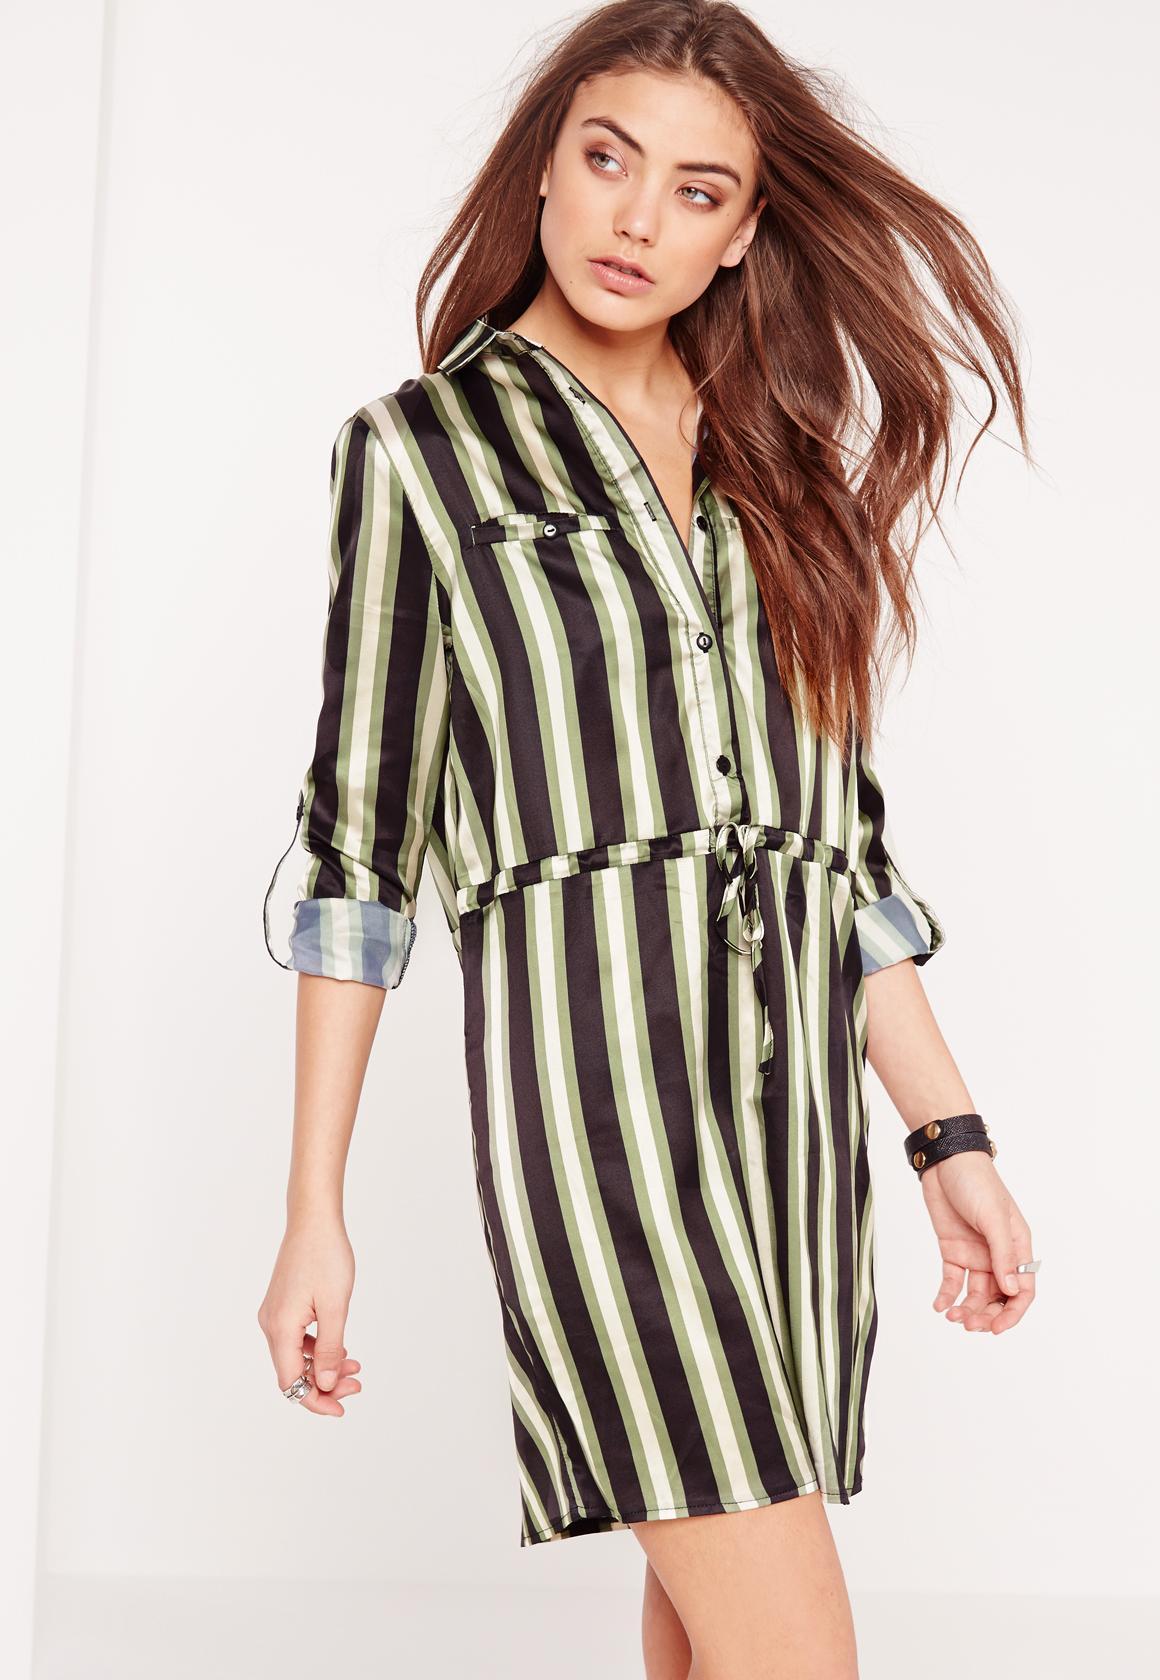 44117fa56b79a Drawstring Waist Shirt Dress Khaki Stripe